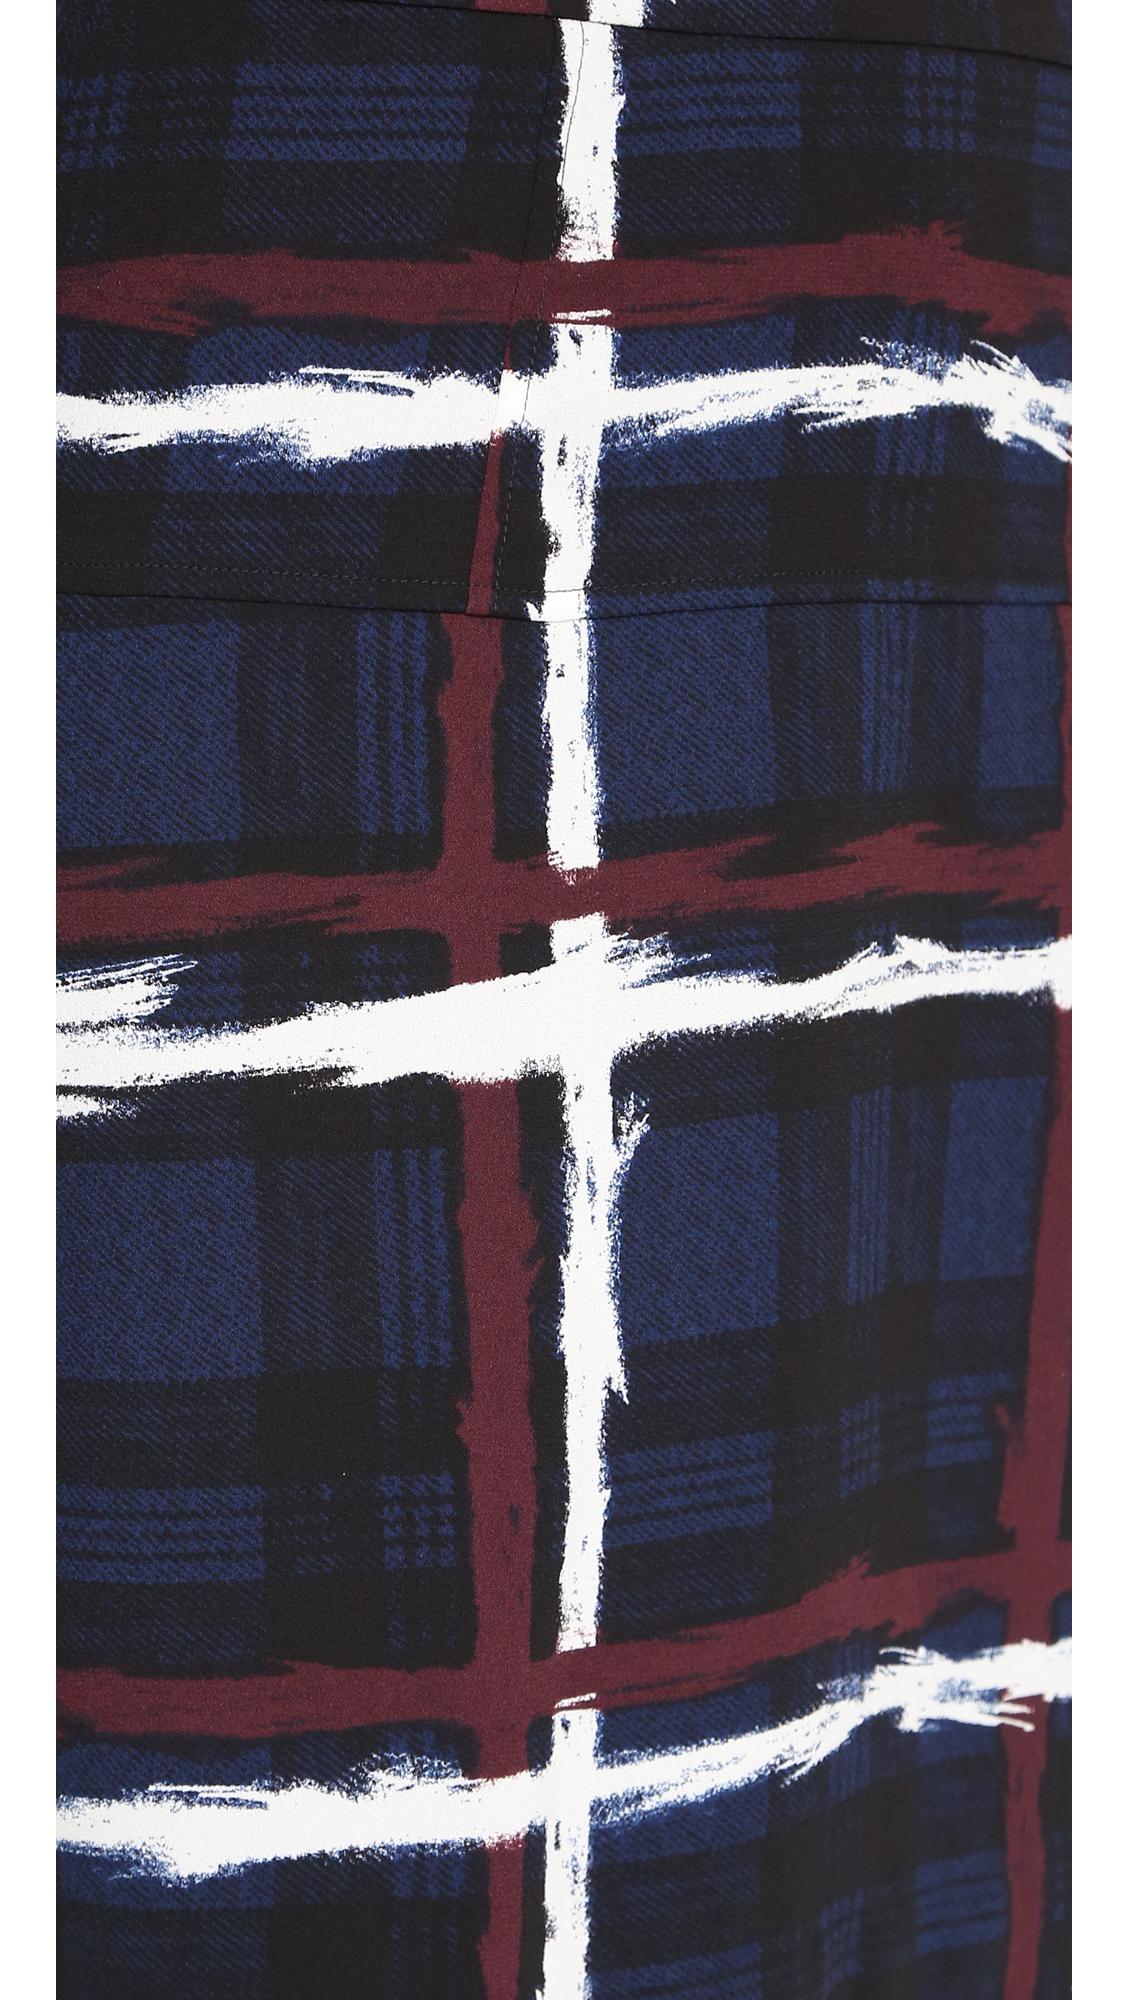 Marc By Marc Jacobs Chalky Tartan Crepe Skirt - Gettysburg Blue Multi